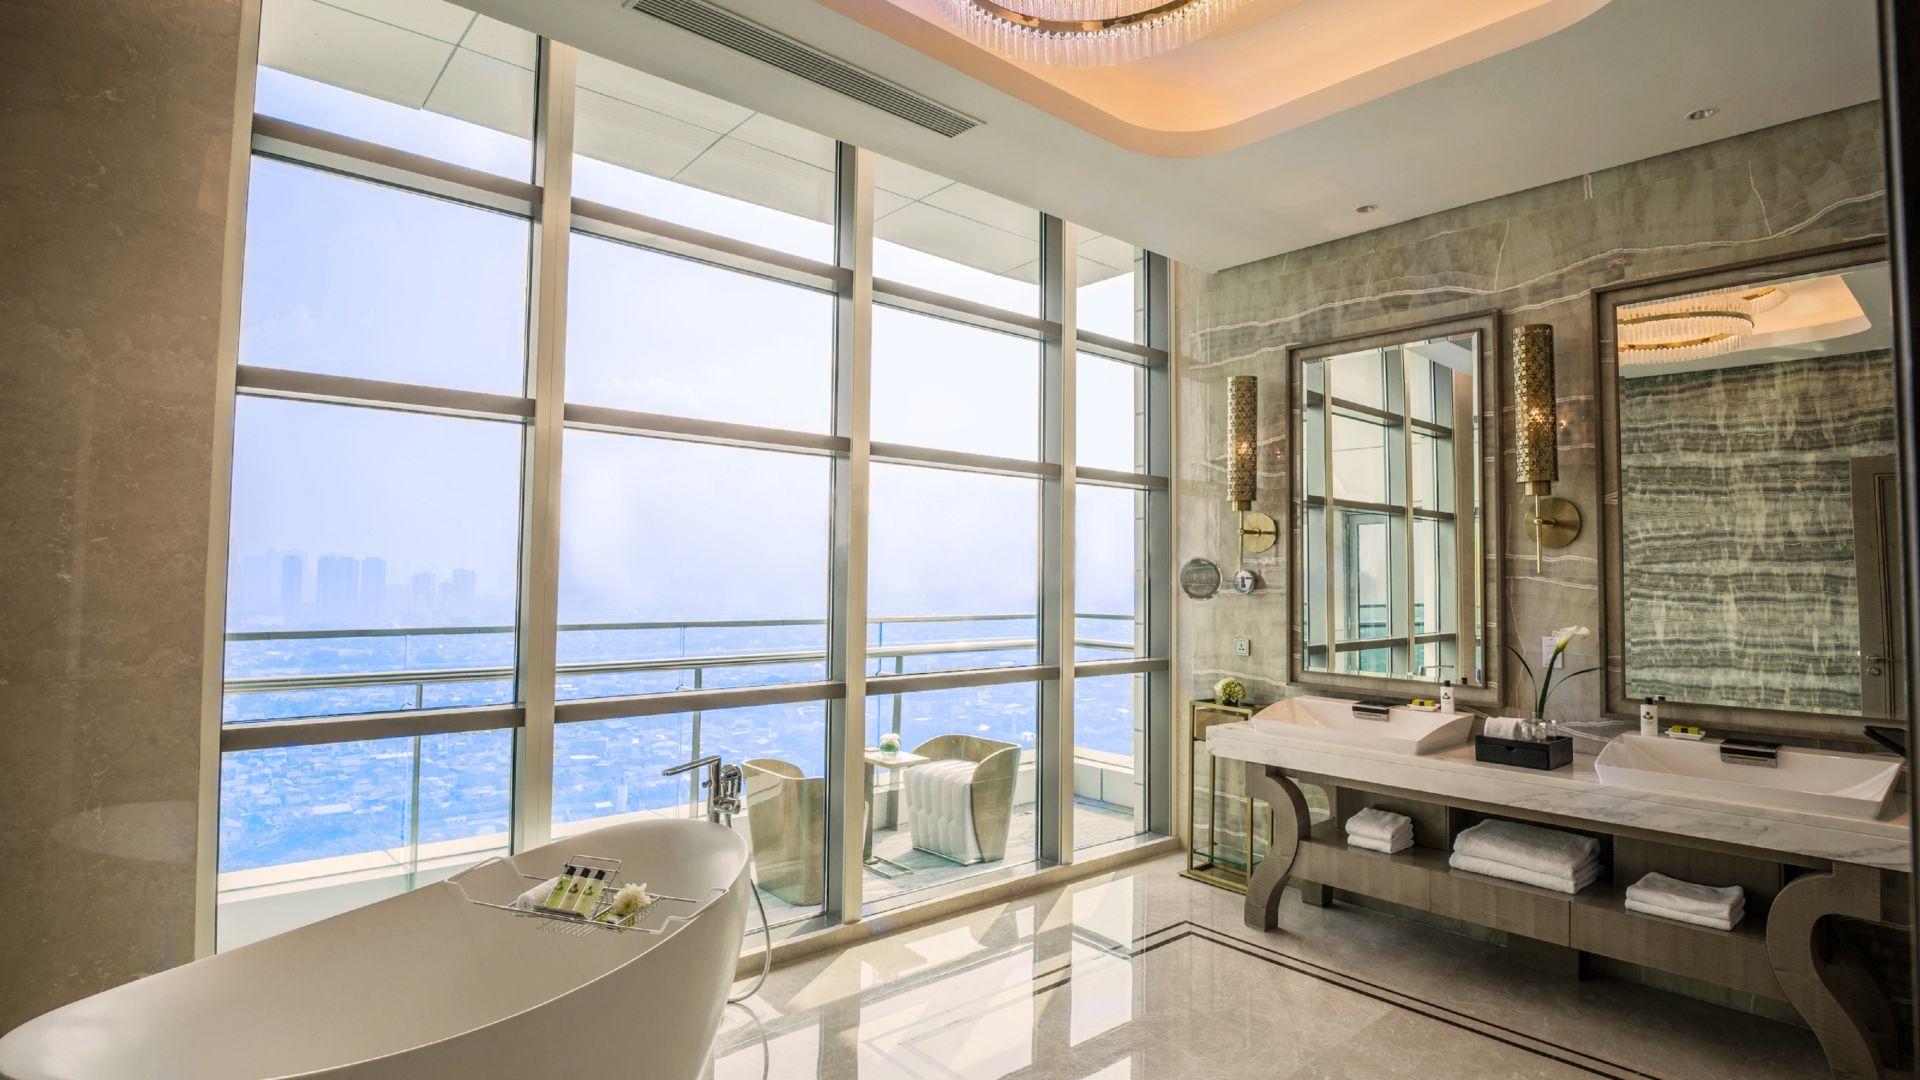 Jakarta Rooms Suites Luxury Hotel South Jakarta